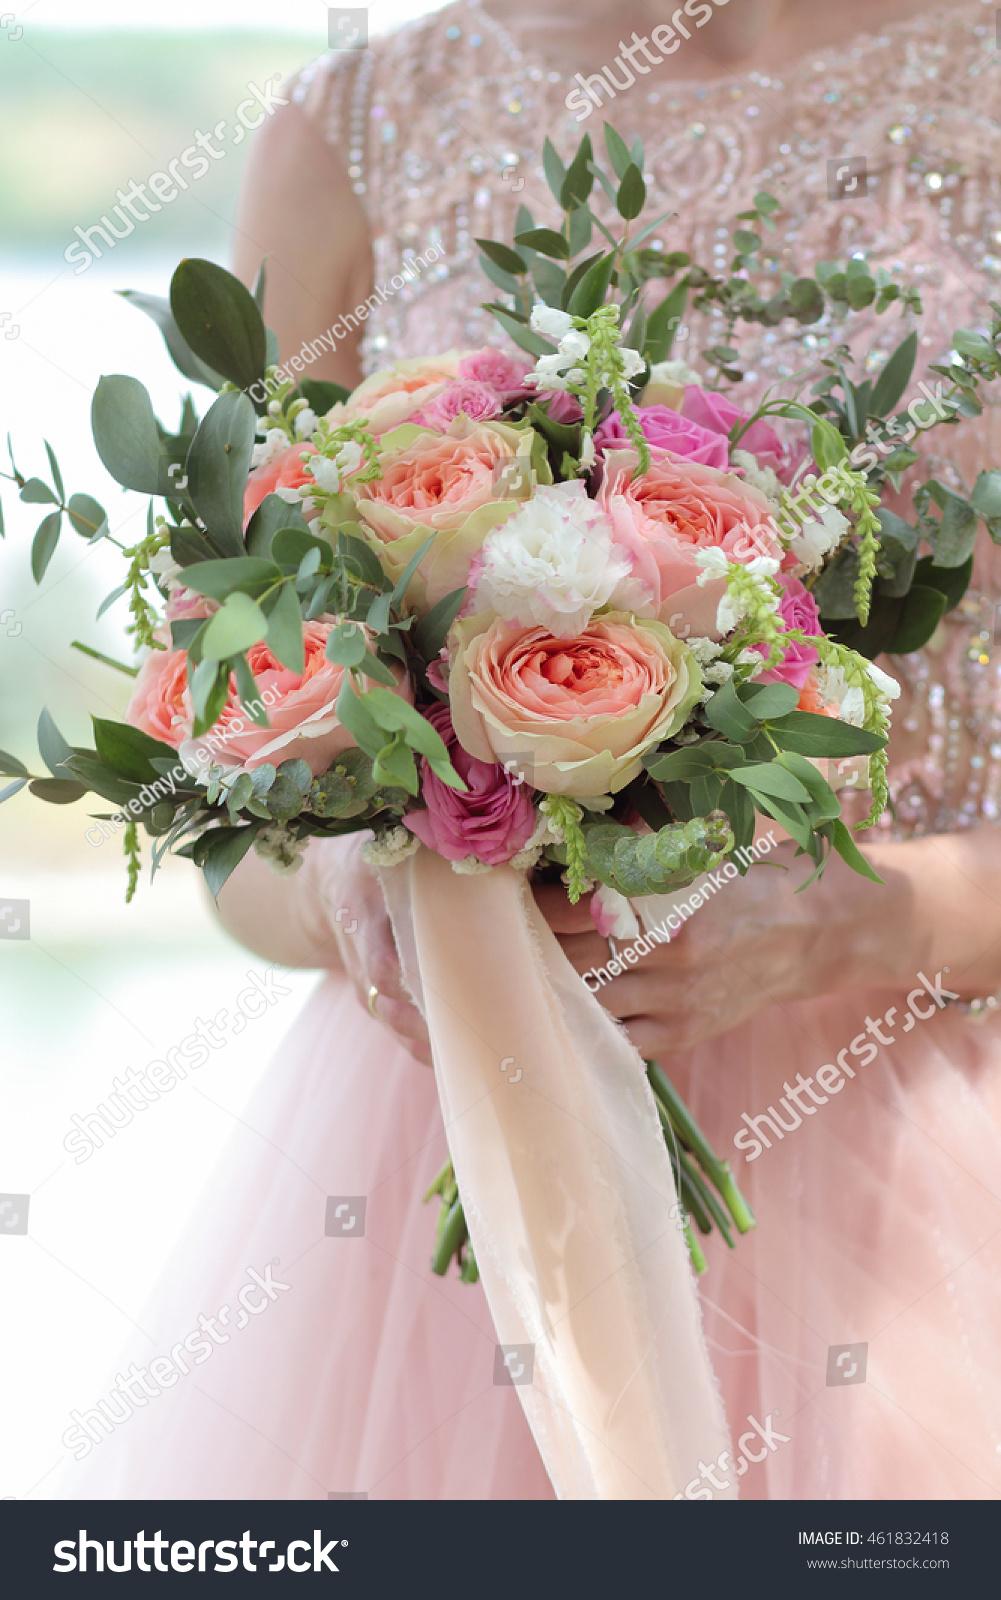 Bride Holding Beautiful Bridal Bouquet Wedding Stock Photo Edit Now